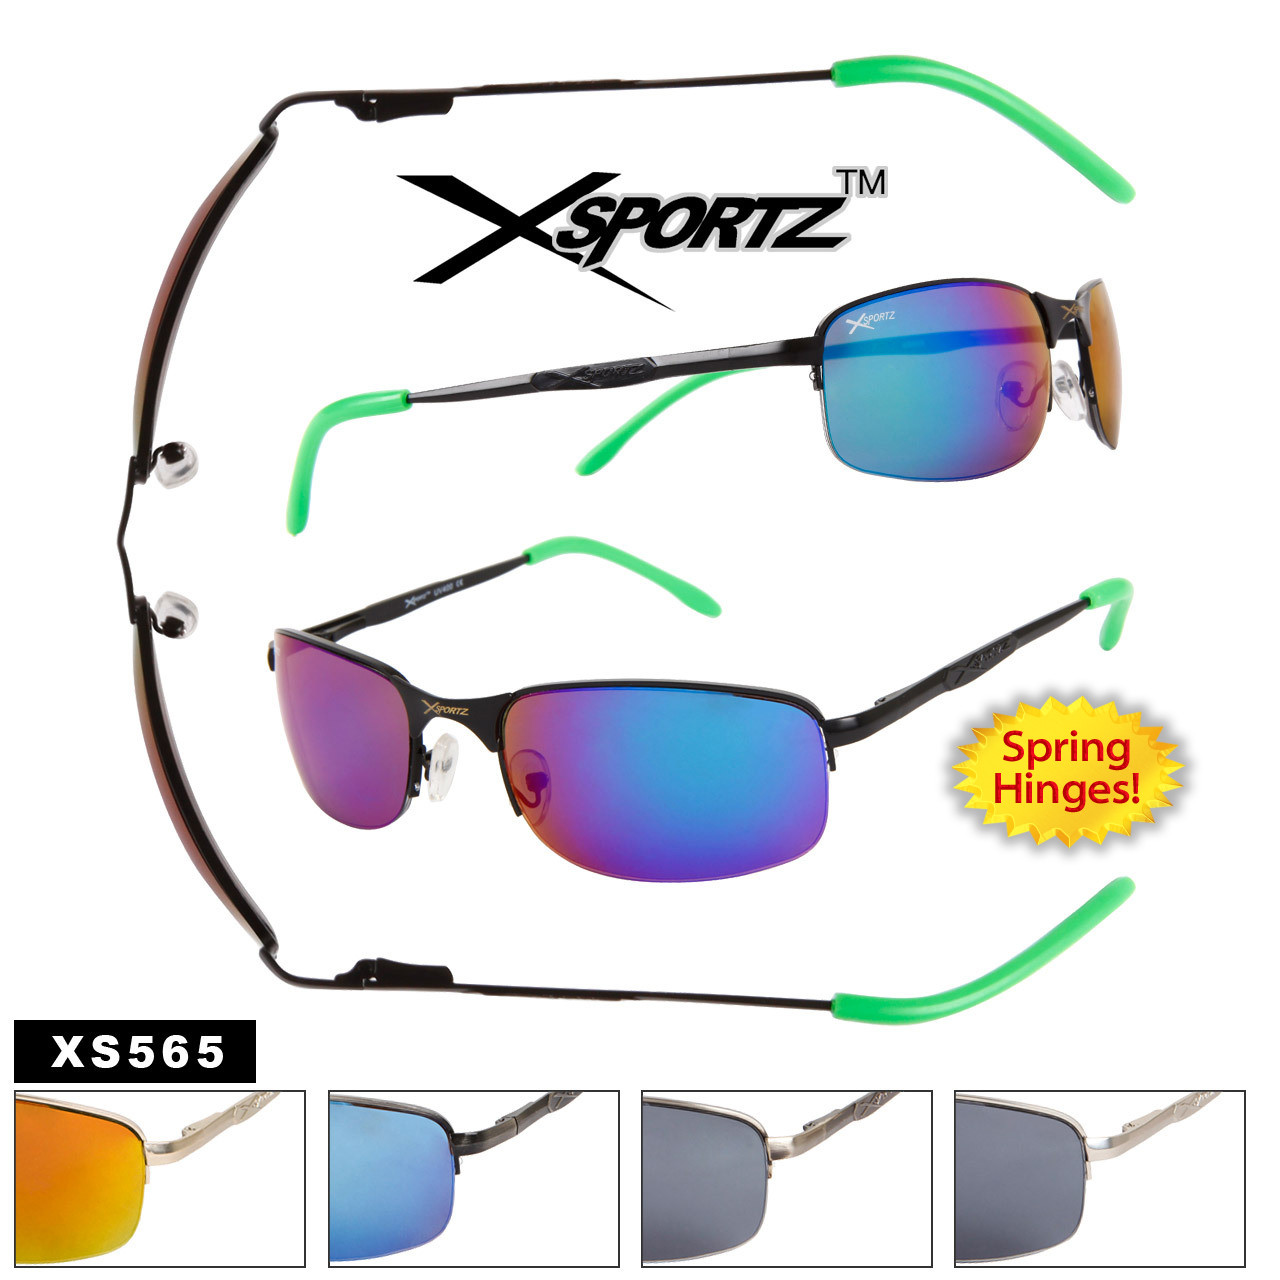 Xsportz™ Metal Frame Sports Sunglasses - Style # XS565